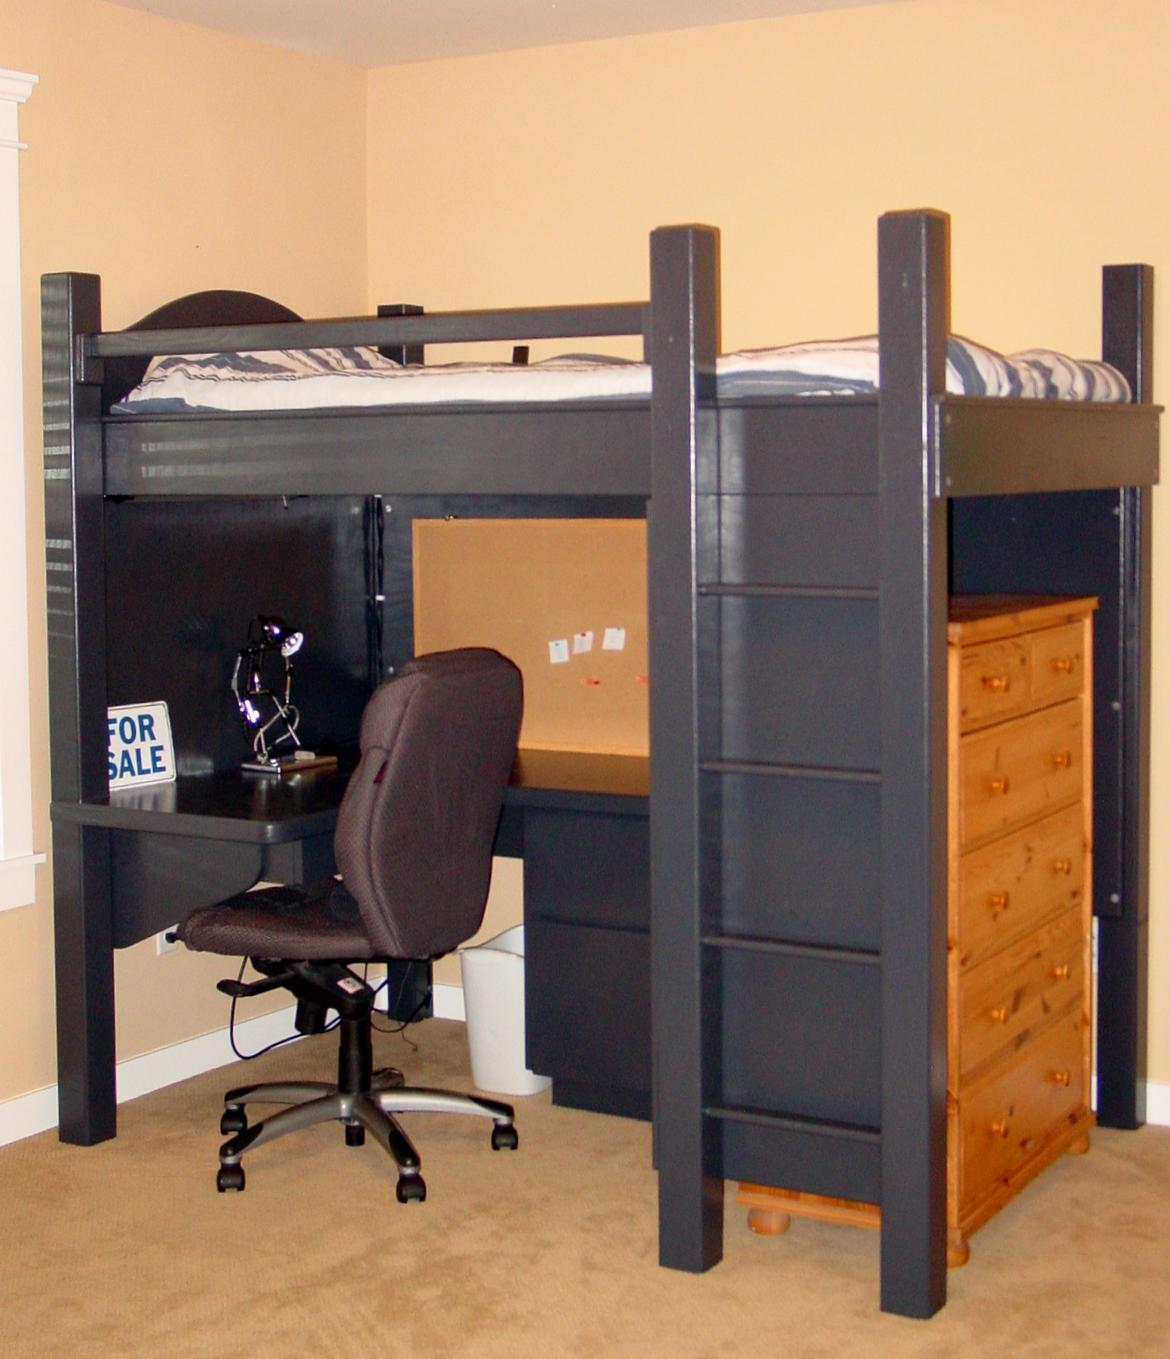 for double high costco bunk africa appealing desks inspiring bedroom beds loft plans under walmart bed underneath with desk bunks south kids decoration